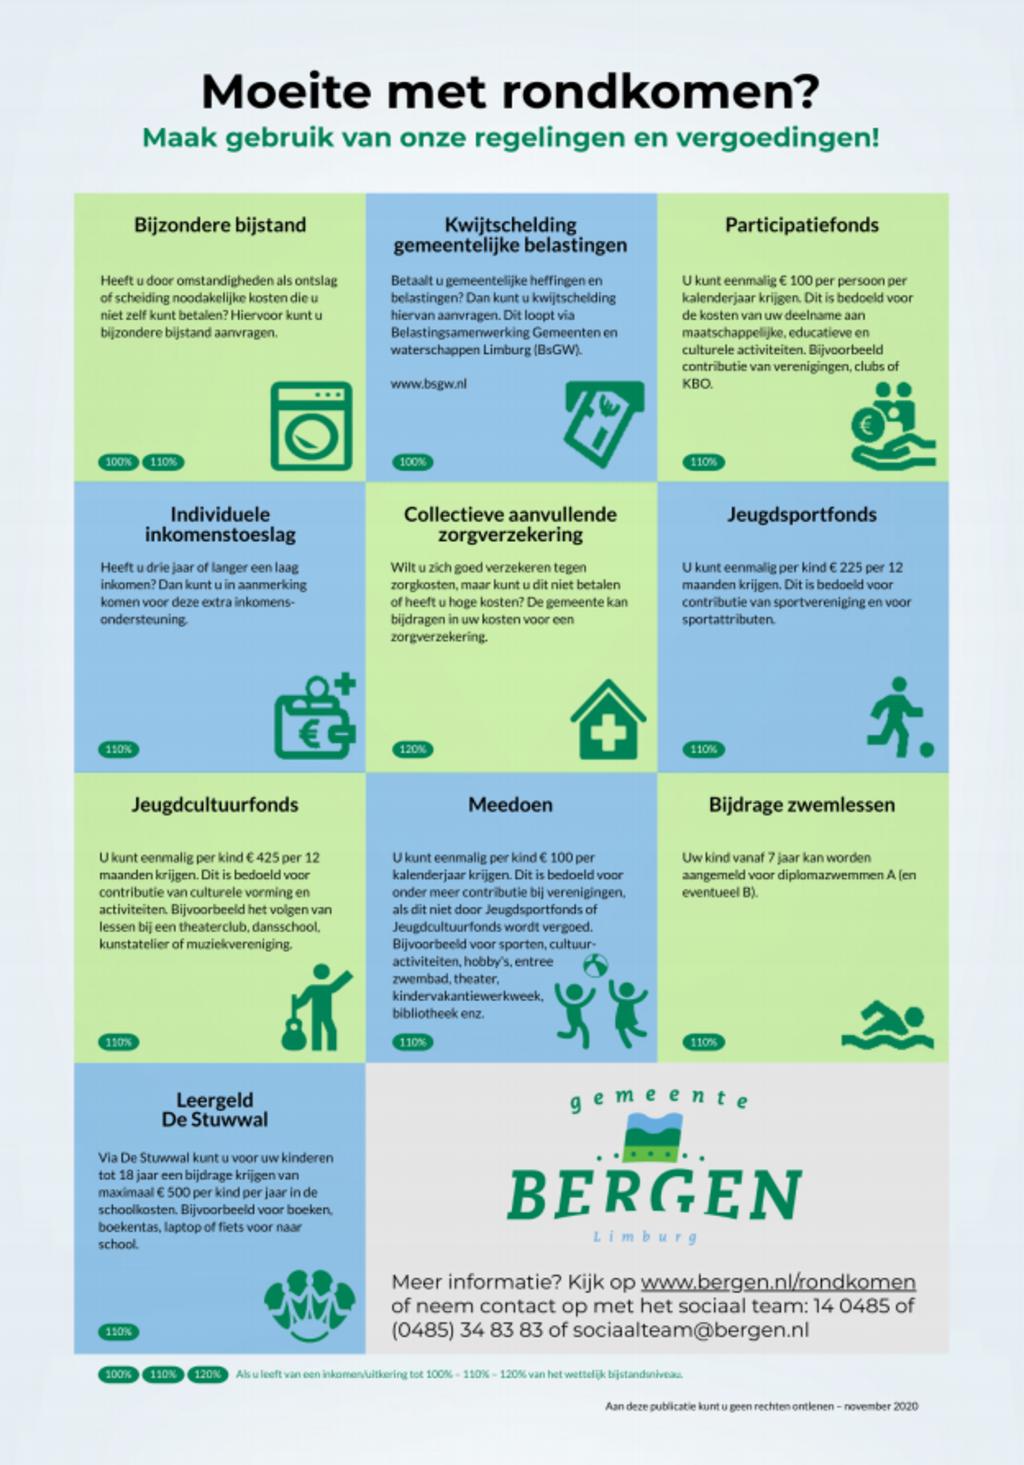 Inkomenskaart Bergen 2020 Foto: Chris Smits © Maasduinencentraal